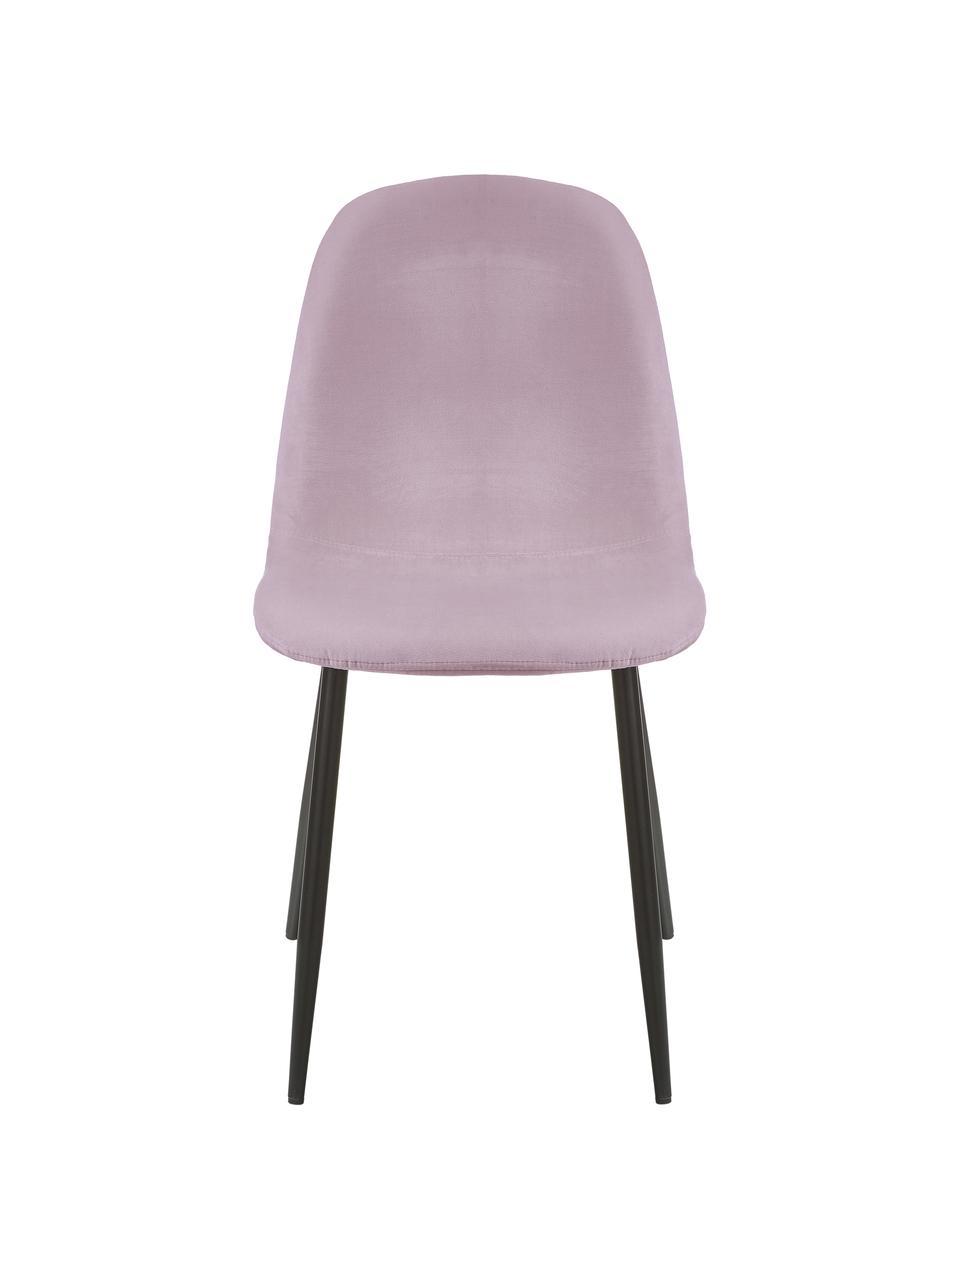 Sedia imbottita in velluto rosa Karla 2 pz, Rivestimento: velluto (100% poliestere), Gambe: metallo verniciato a polv, Velluto rosa, Larg. 44 x Alt. 53 cm